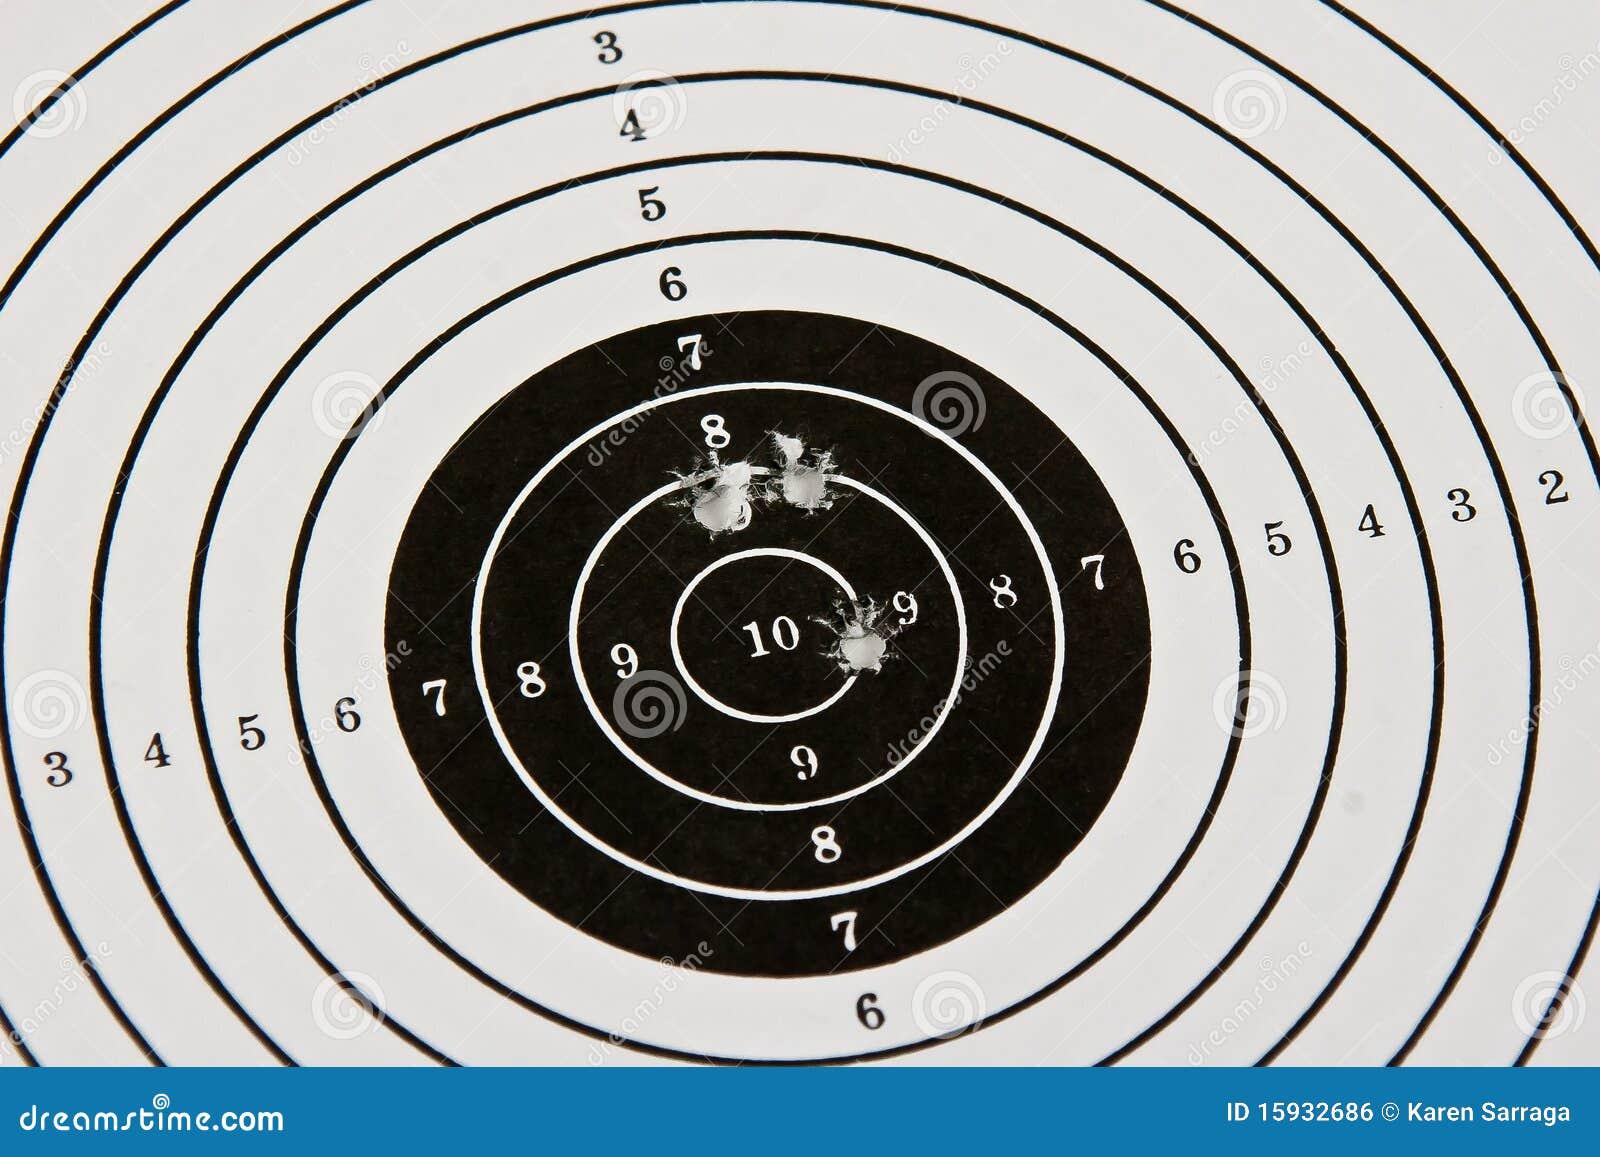 bulls eye target with bullet holes royalty free stock vector art bullet holes free Skull Bullet Hole Vector